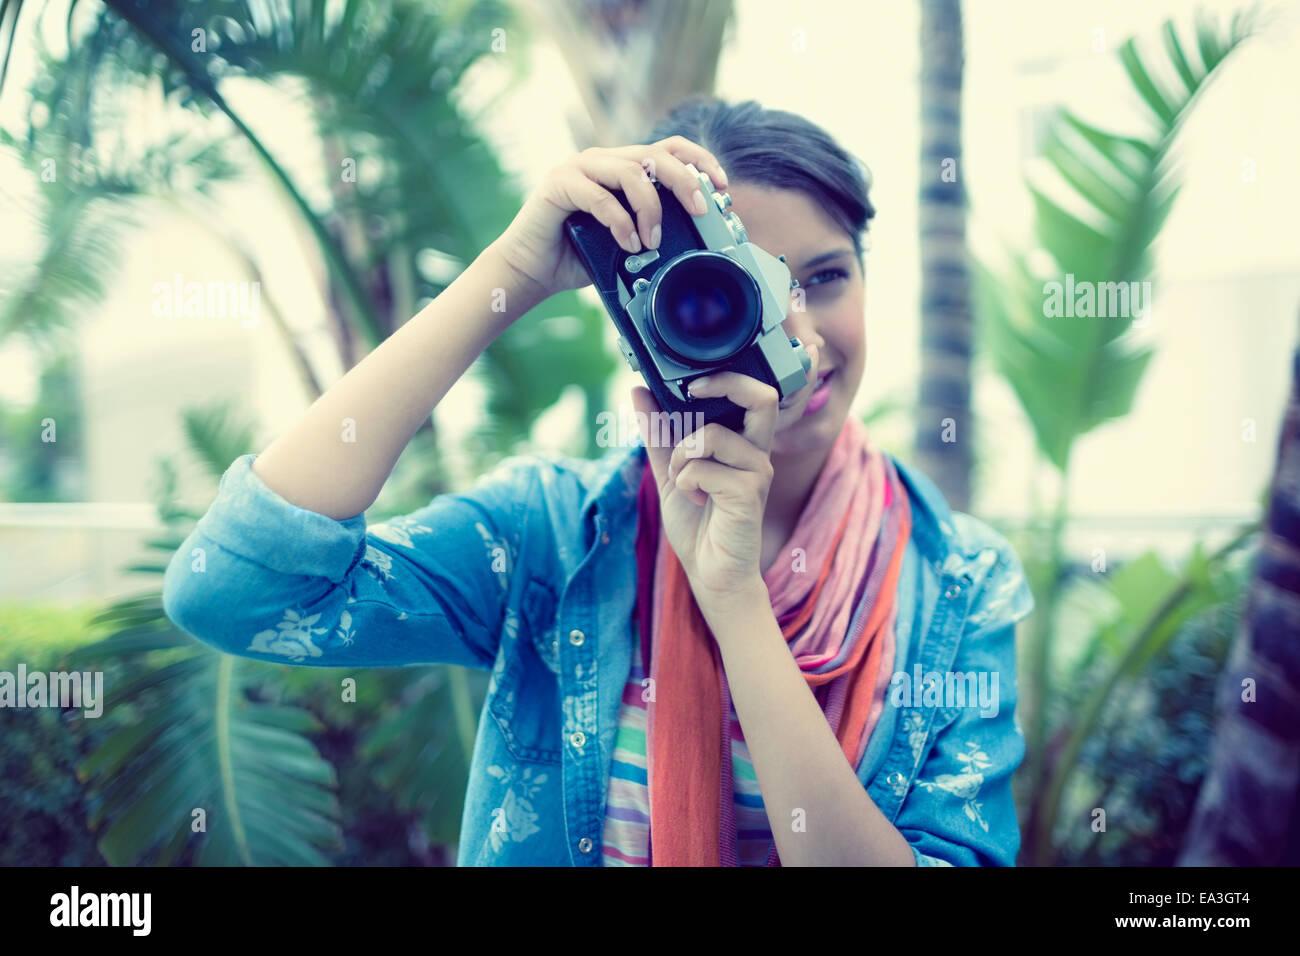 Lächelnde Brünette Fotografieren außerhalb Stockbild